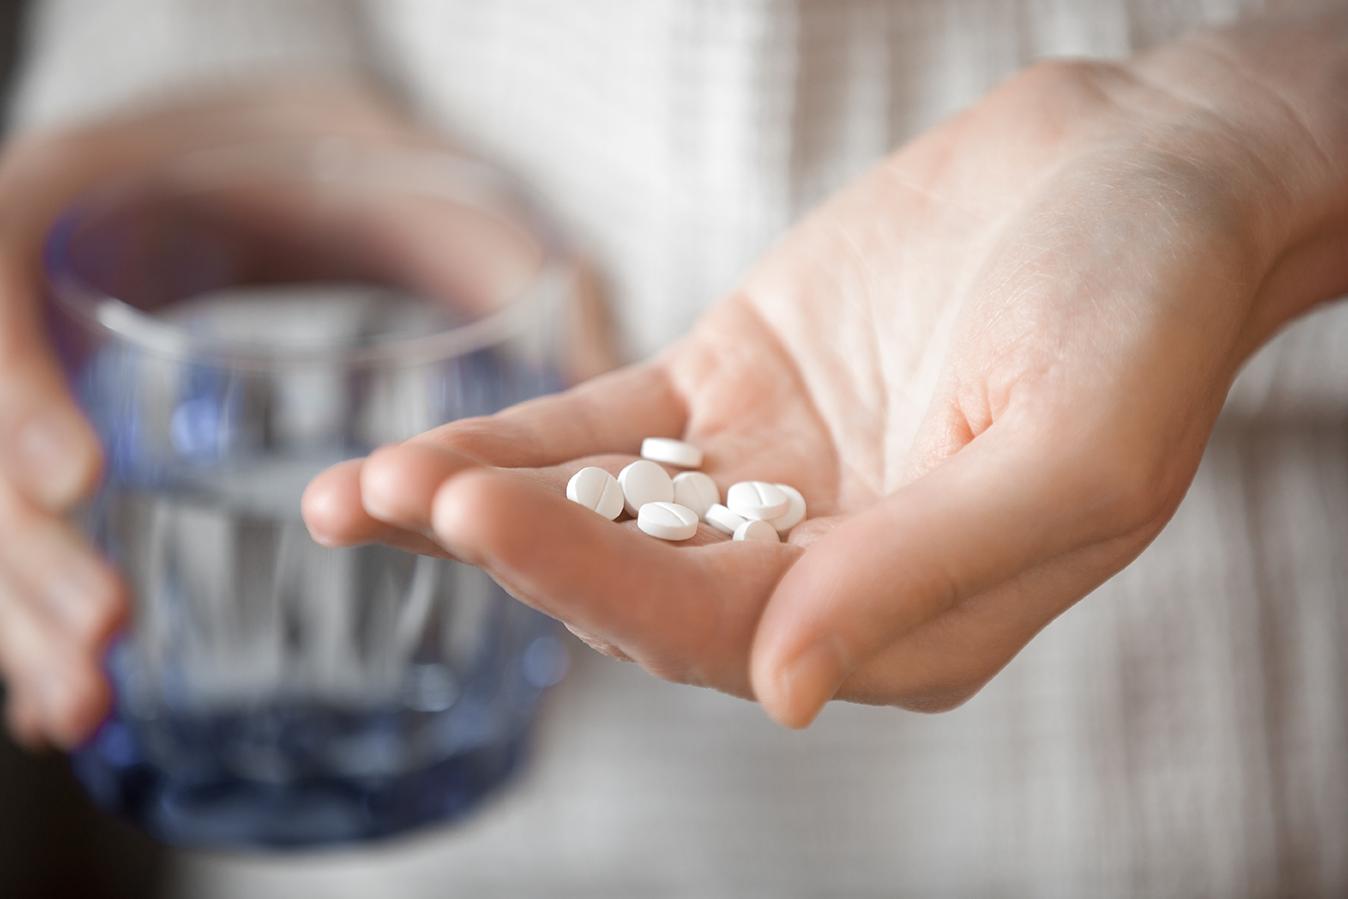 medicinmisbrug håndkøbsmedicin